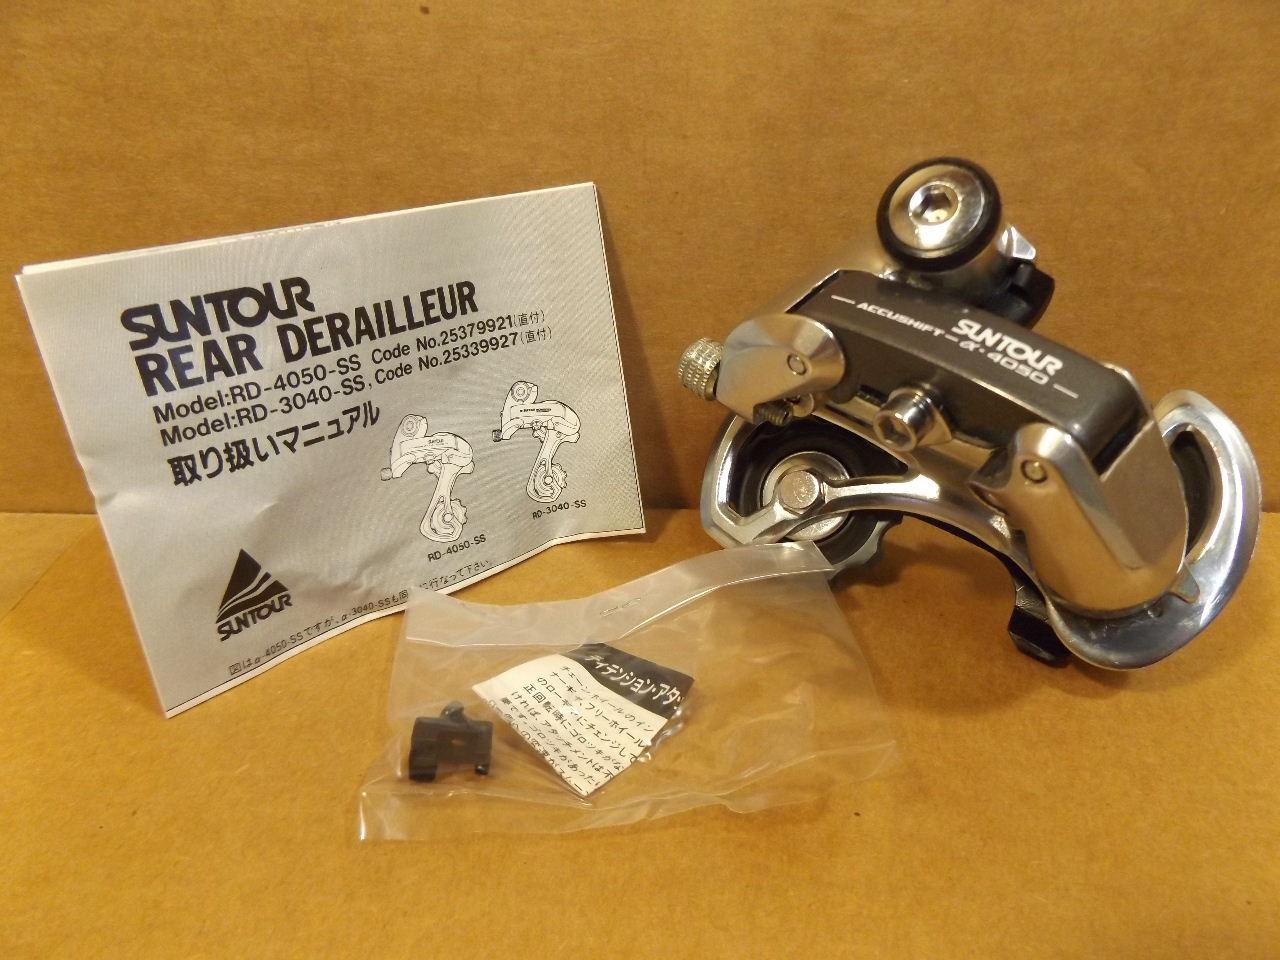 New-Old-Stock Suntour 4050 6-Speed Shifter//Derailleur Set...Retail Packaged